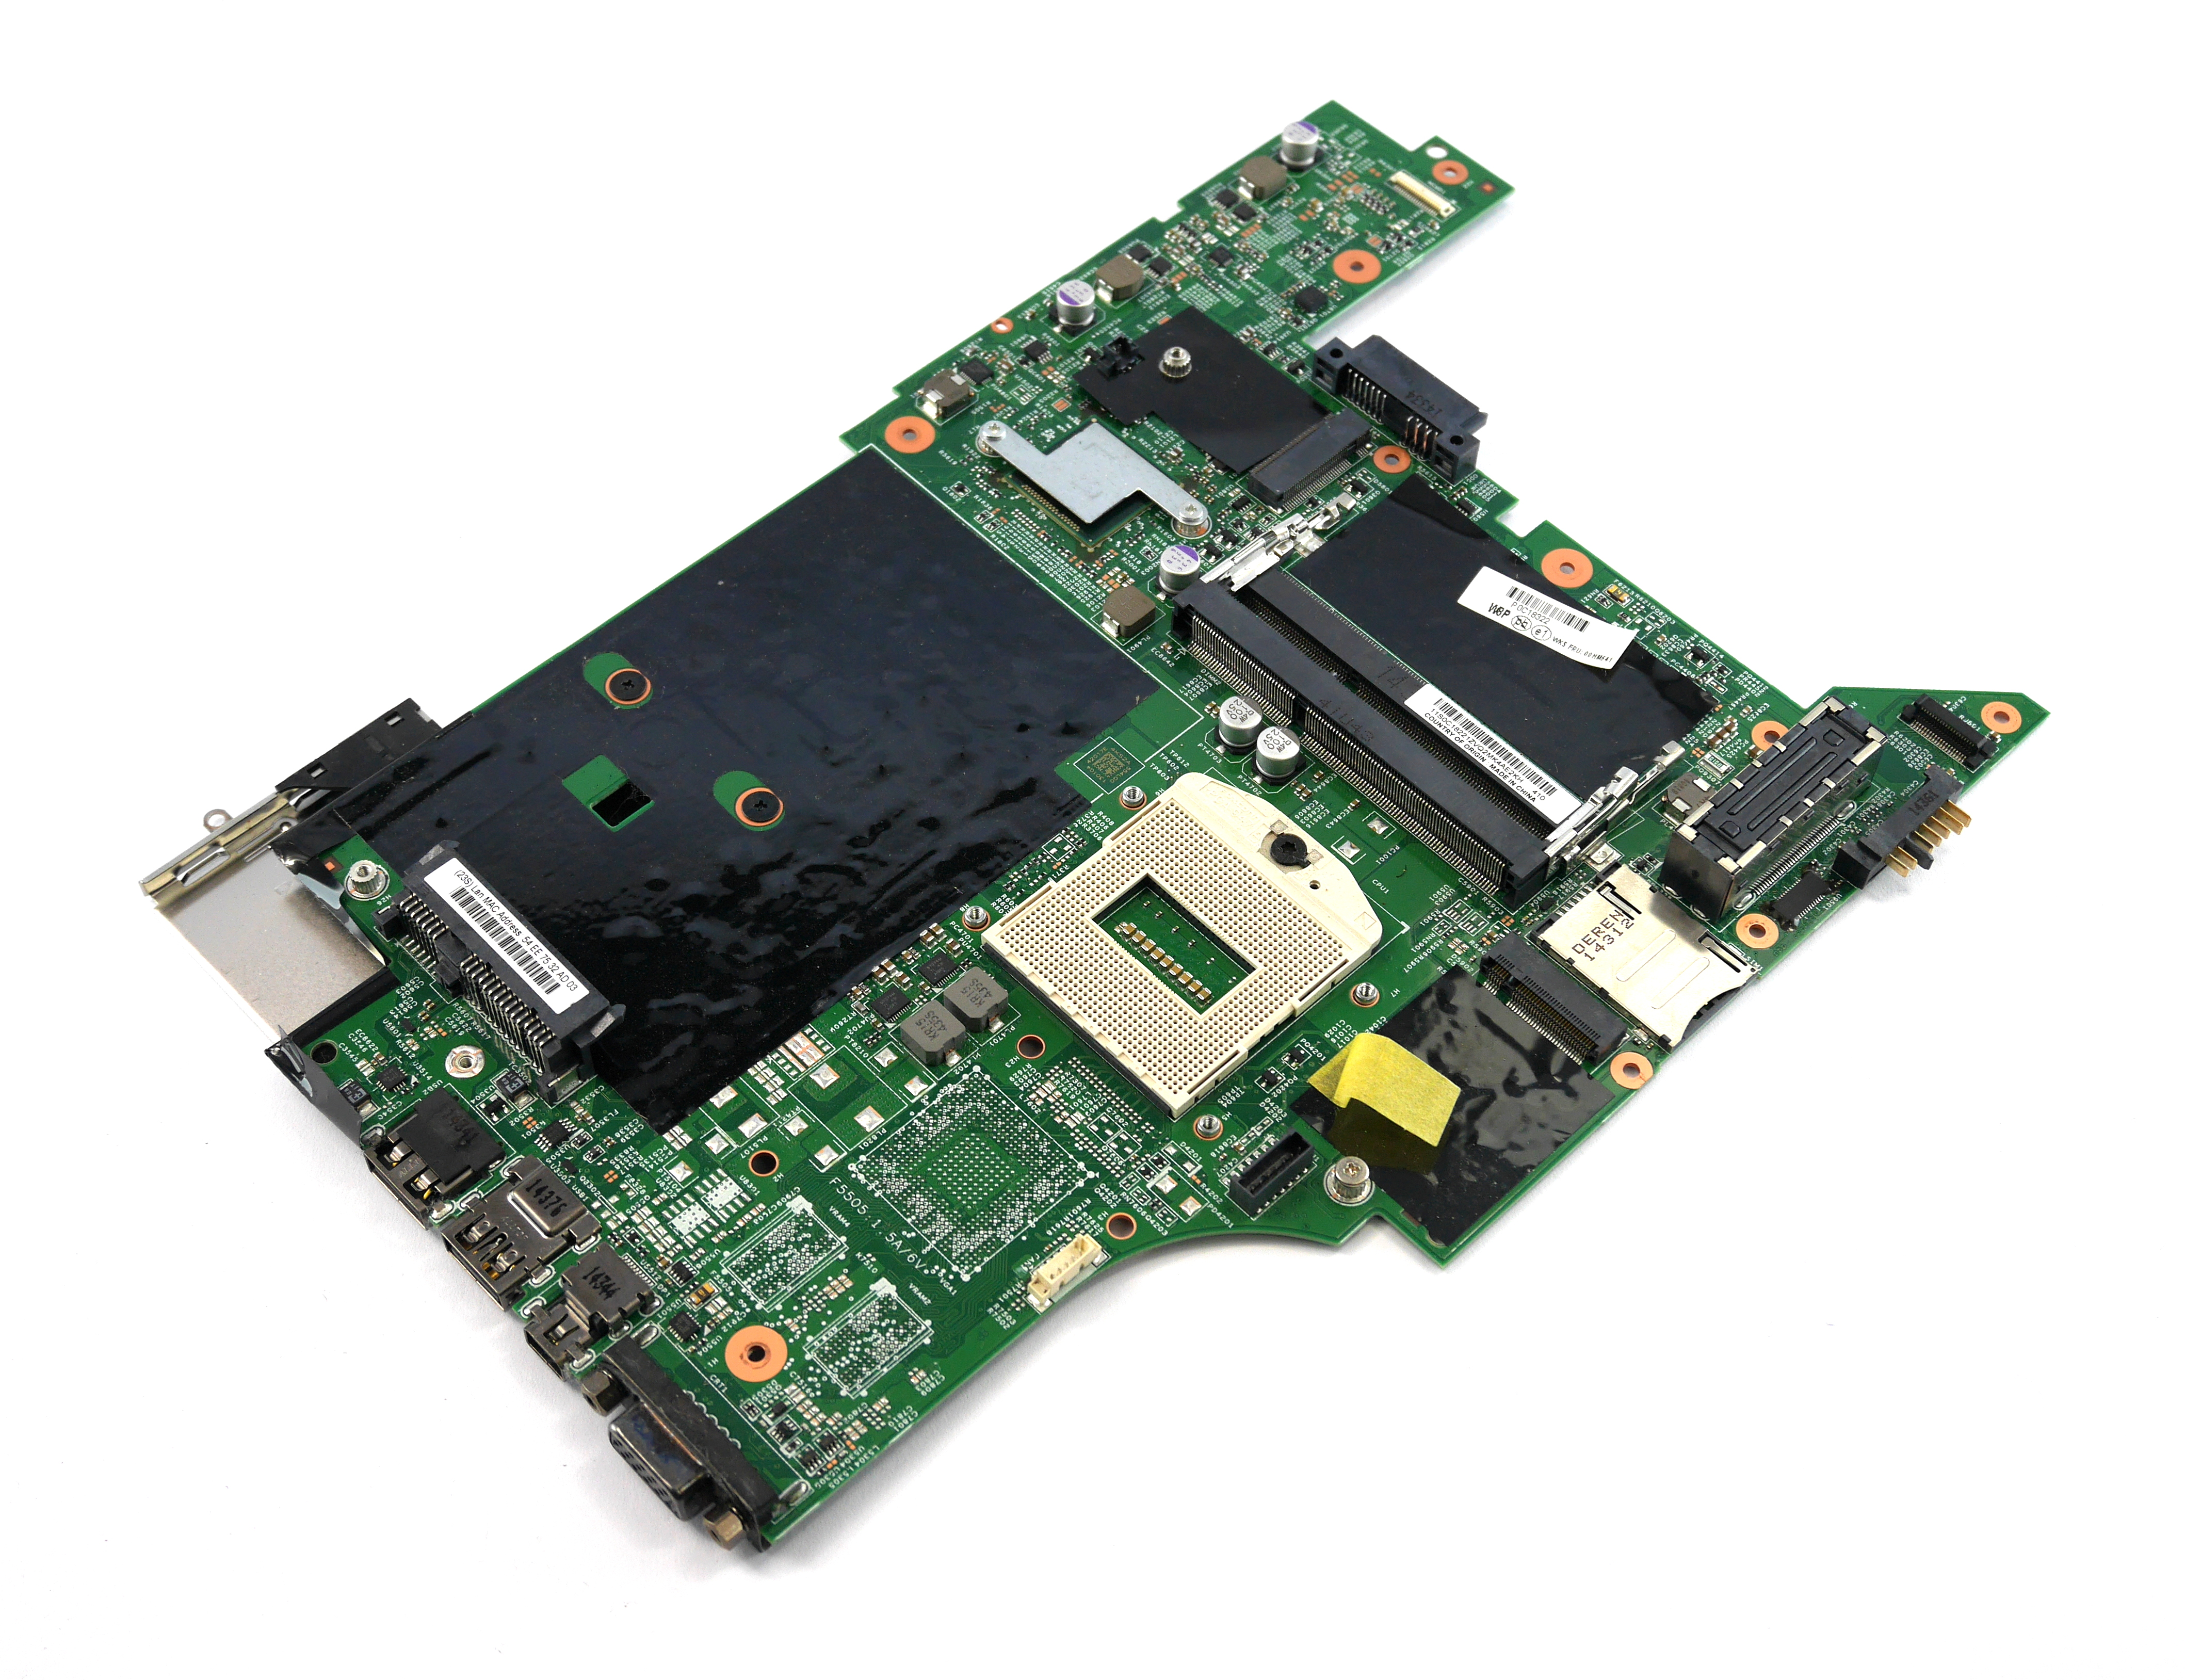 Lenovo 00HM641 ThinkPad L440 Laptop Motherboard